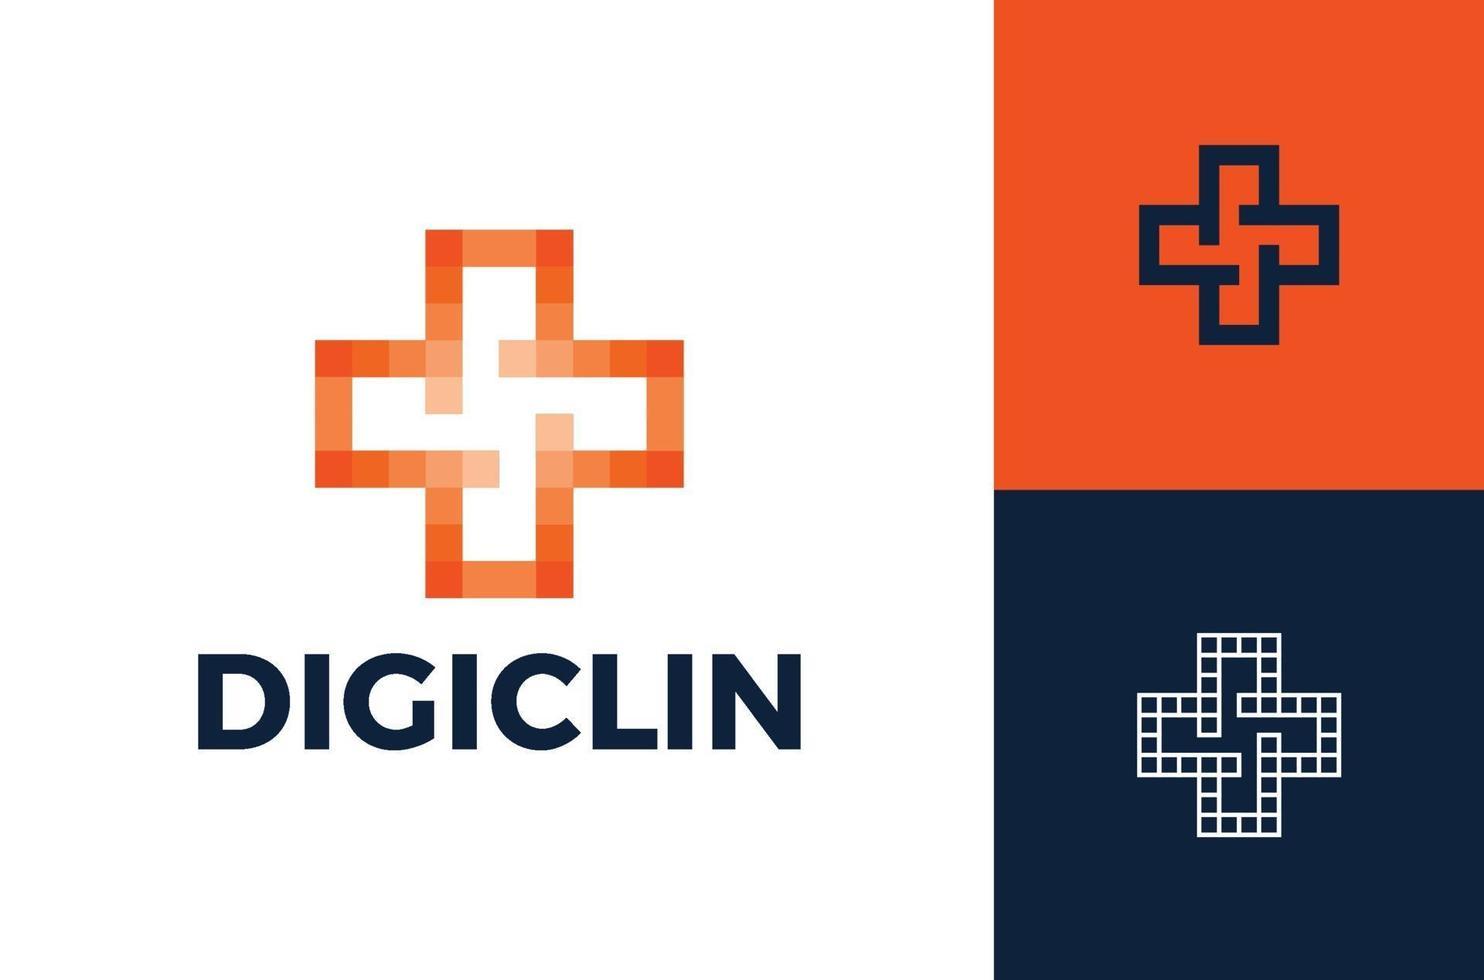 cross pixel medicinsk logotyp design modern mall. pixel hälsa logotyp design mall, medicinsk logotyp i modern stil vektor, teknik logotyp mall vektor